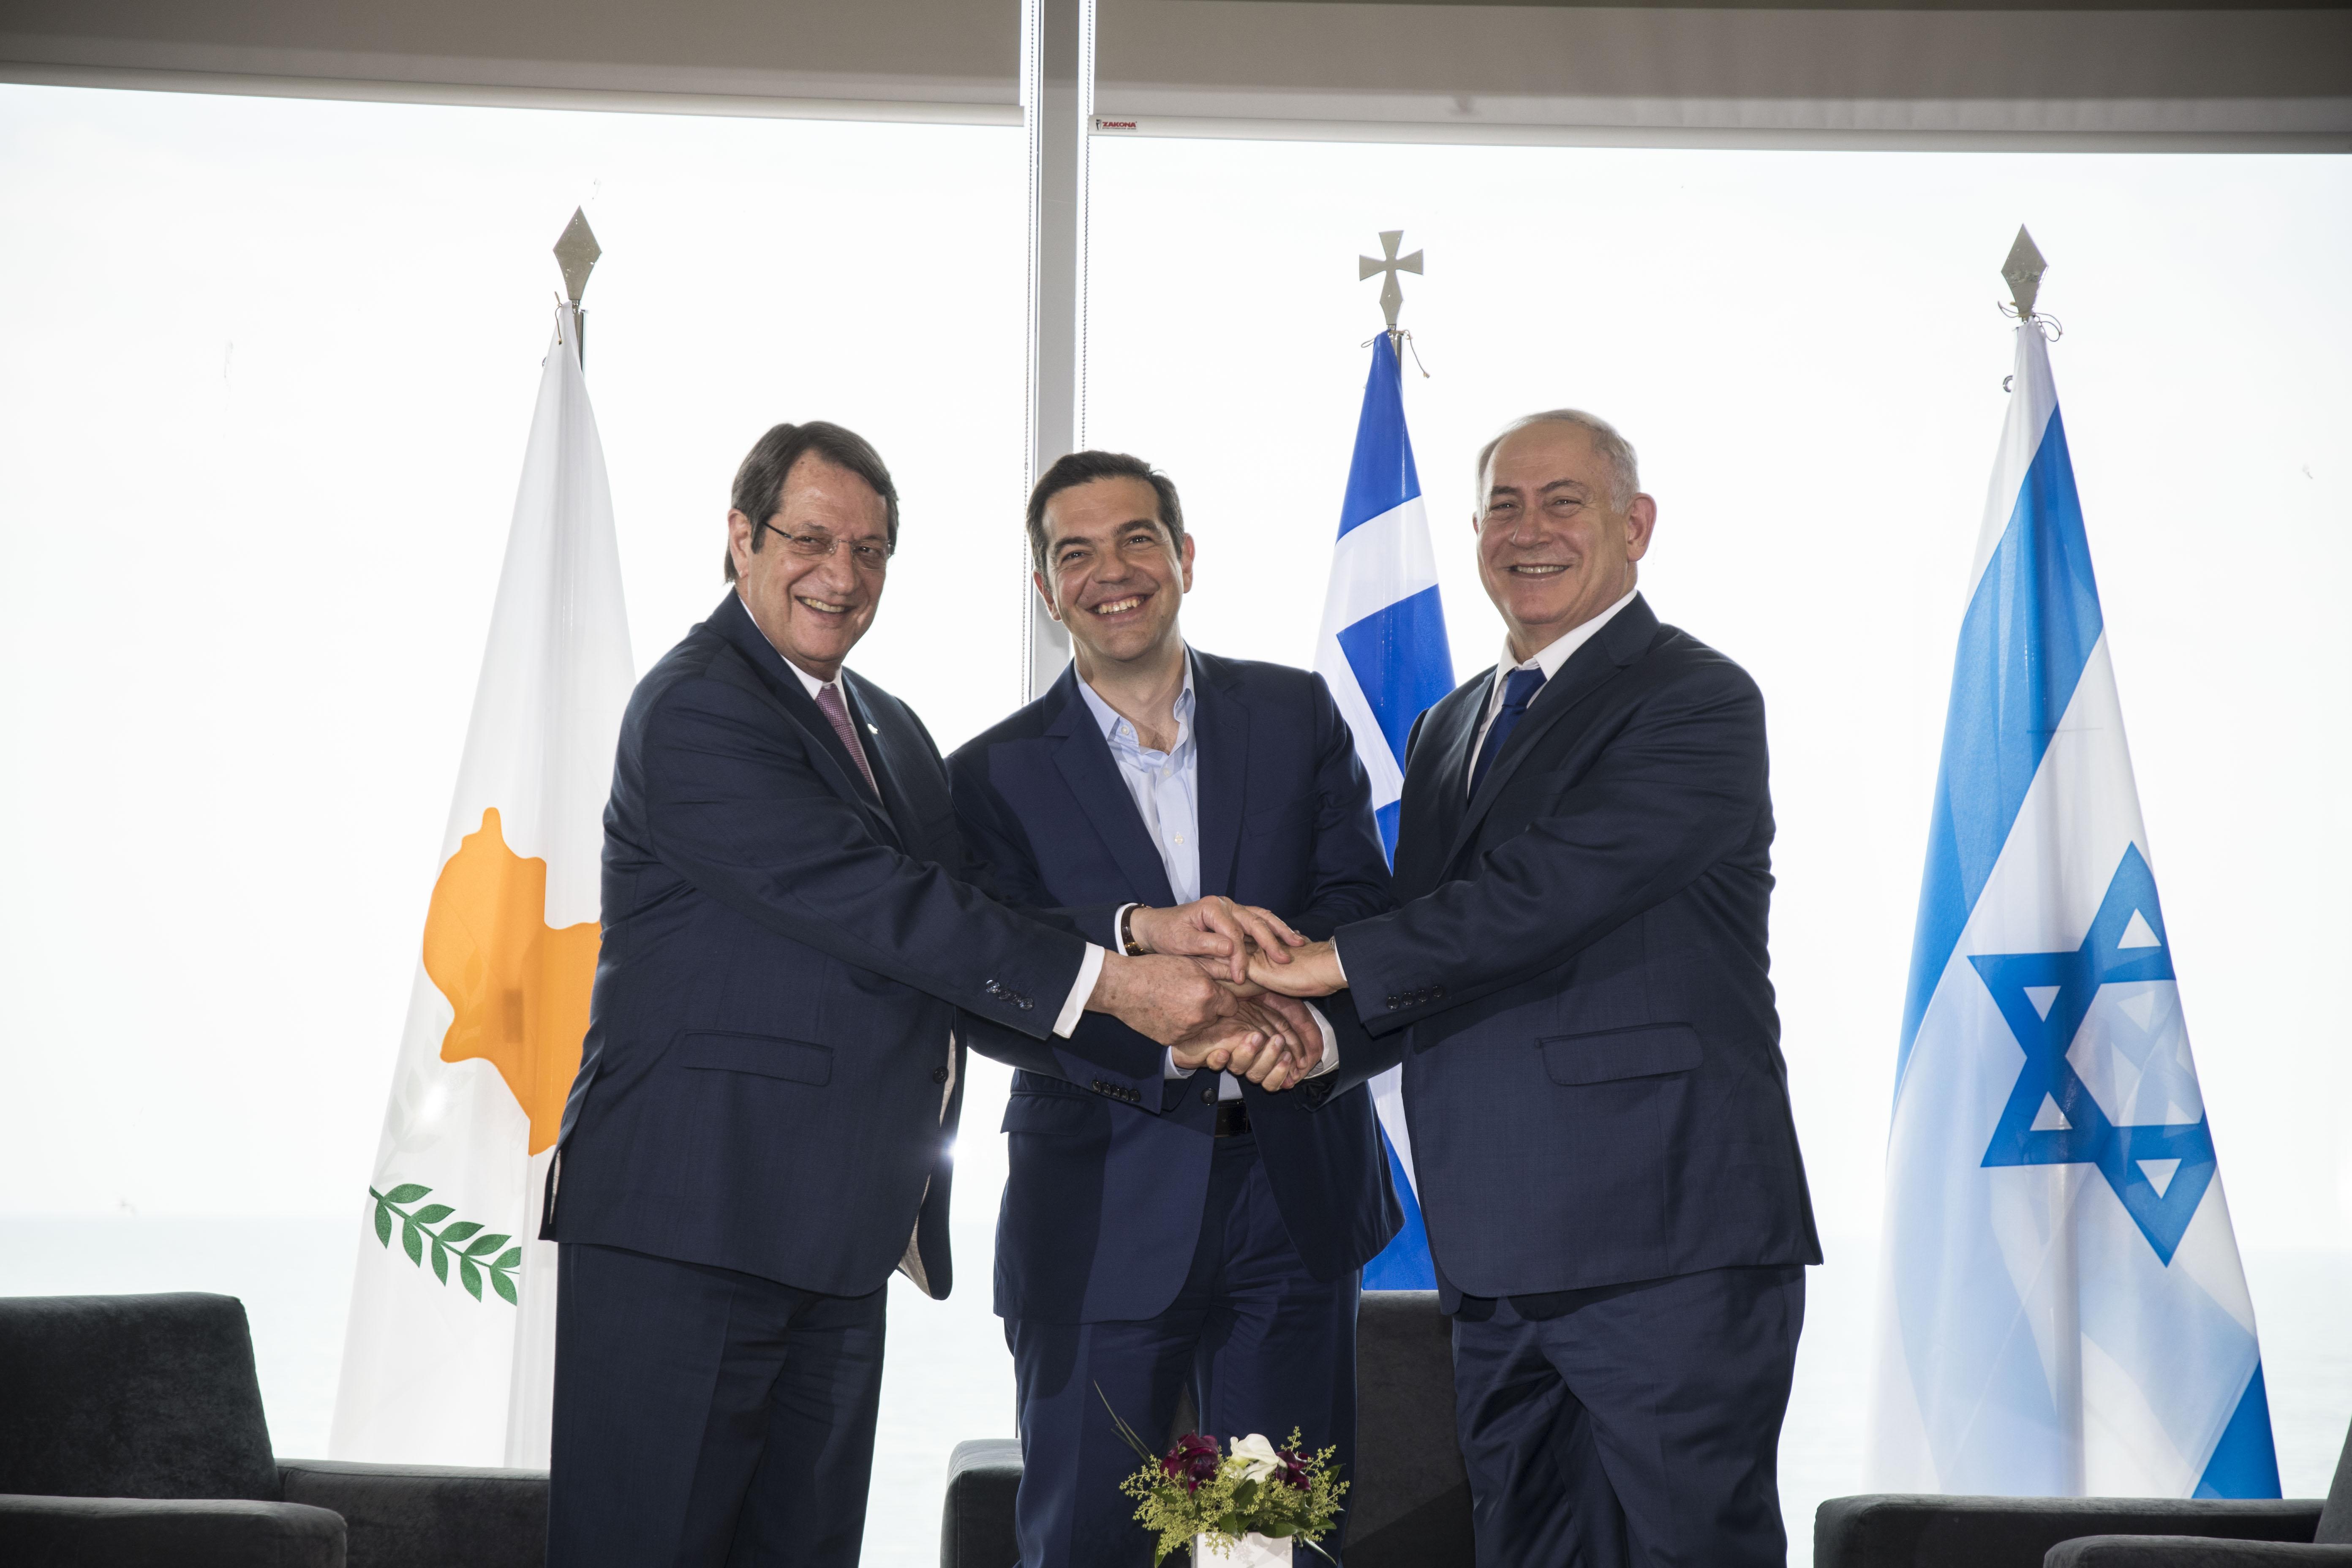 Joint Declaration Greece-Cyprus-Israel Trilateral Summit, Thessaloniki 15.06.2017